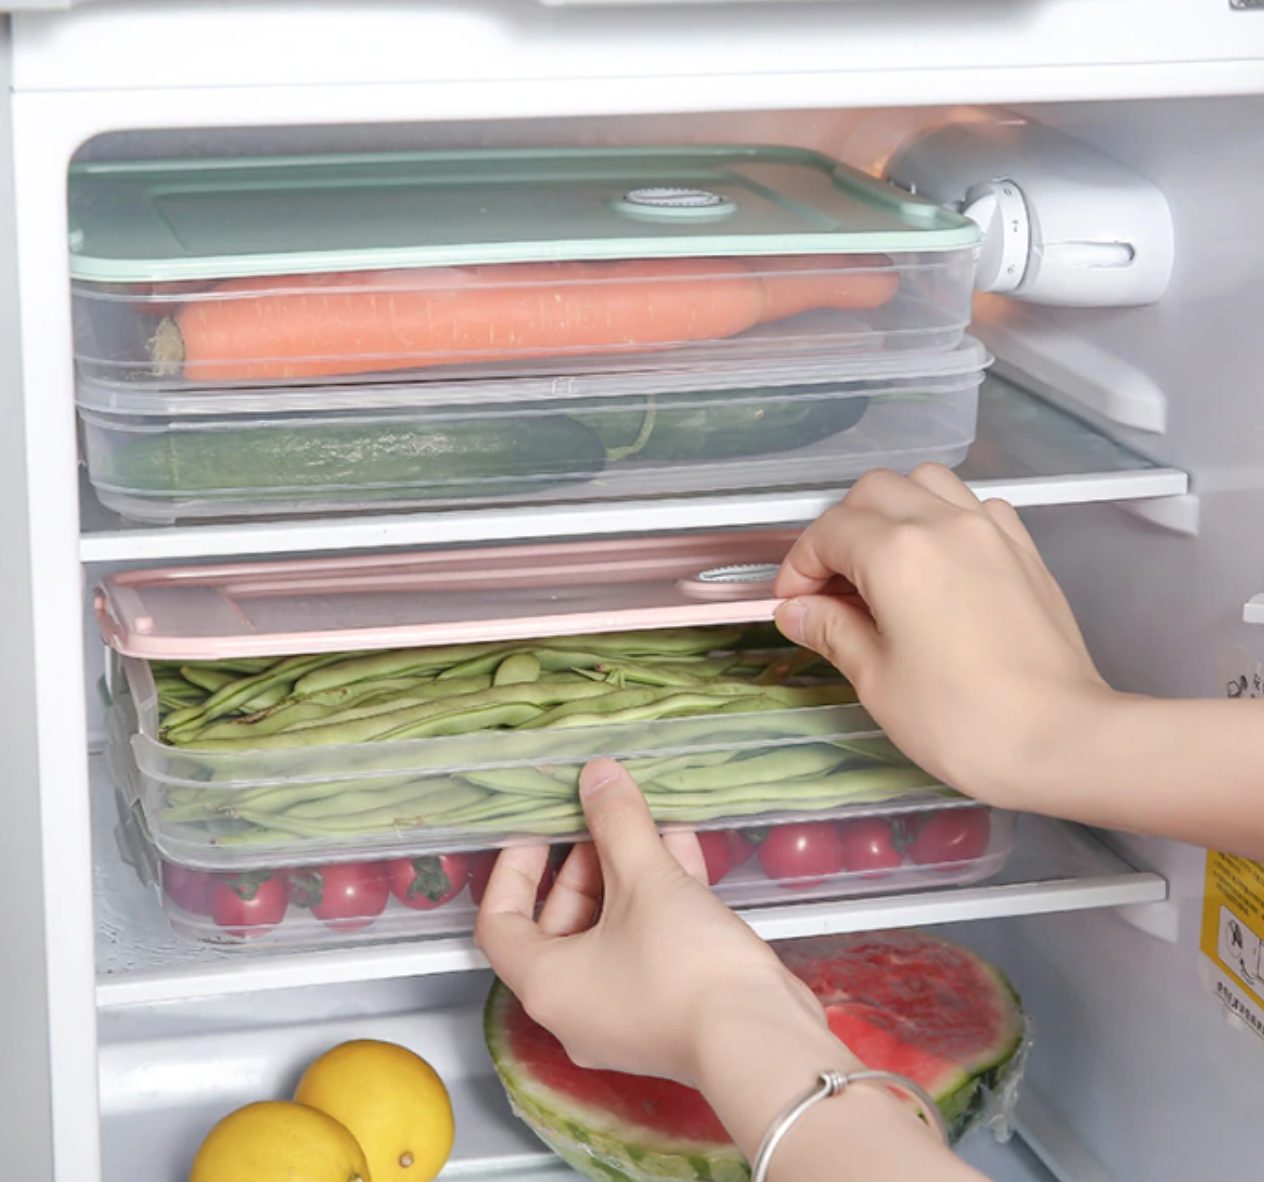 Bandeja para albóndigas de cocina, caja de dumpling congelada para el hogar, nevera, Caja de almacenaje para alimentos, Caja de almacenaje para congelador, organizador transparente